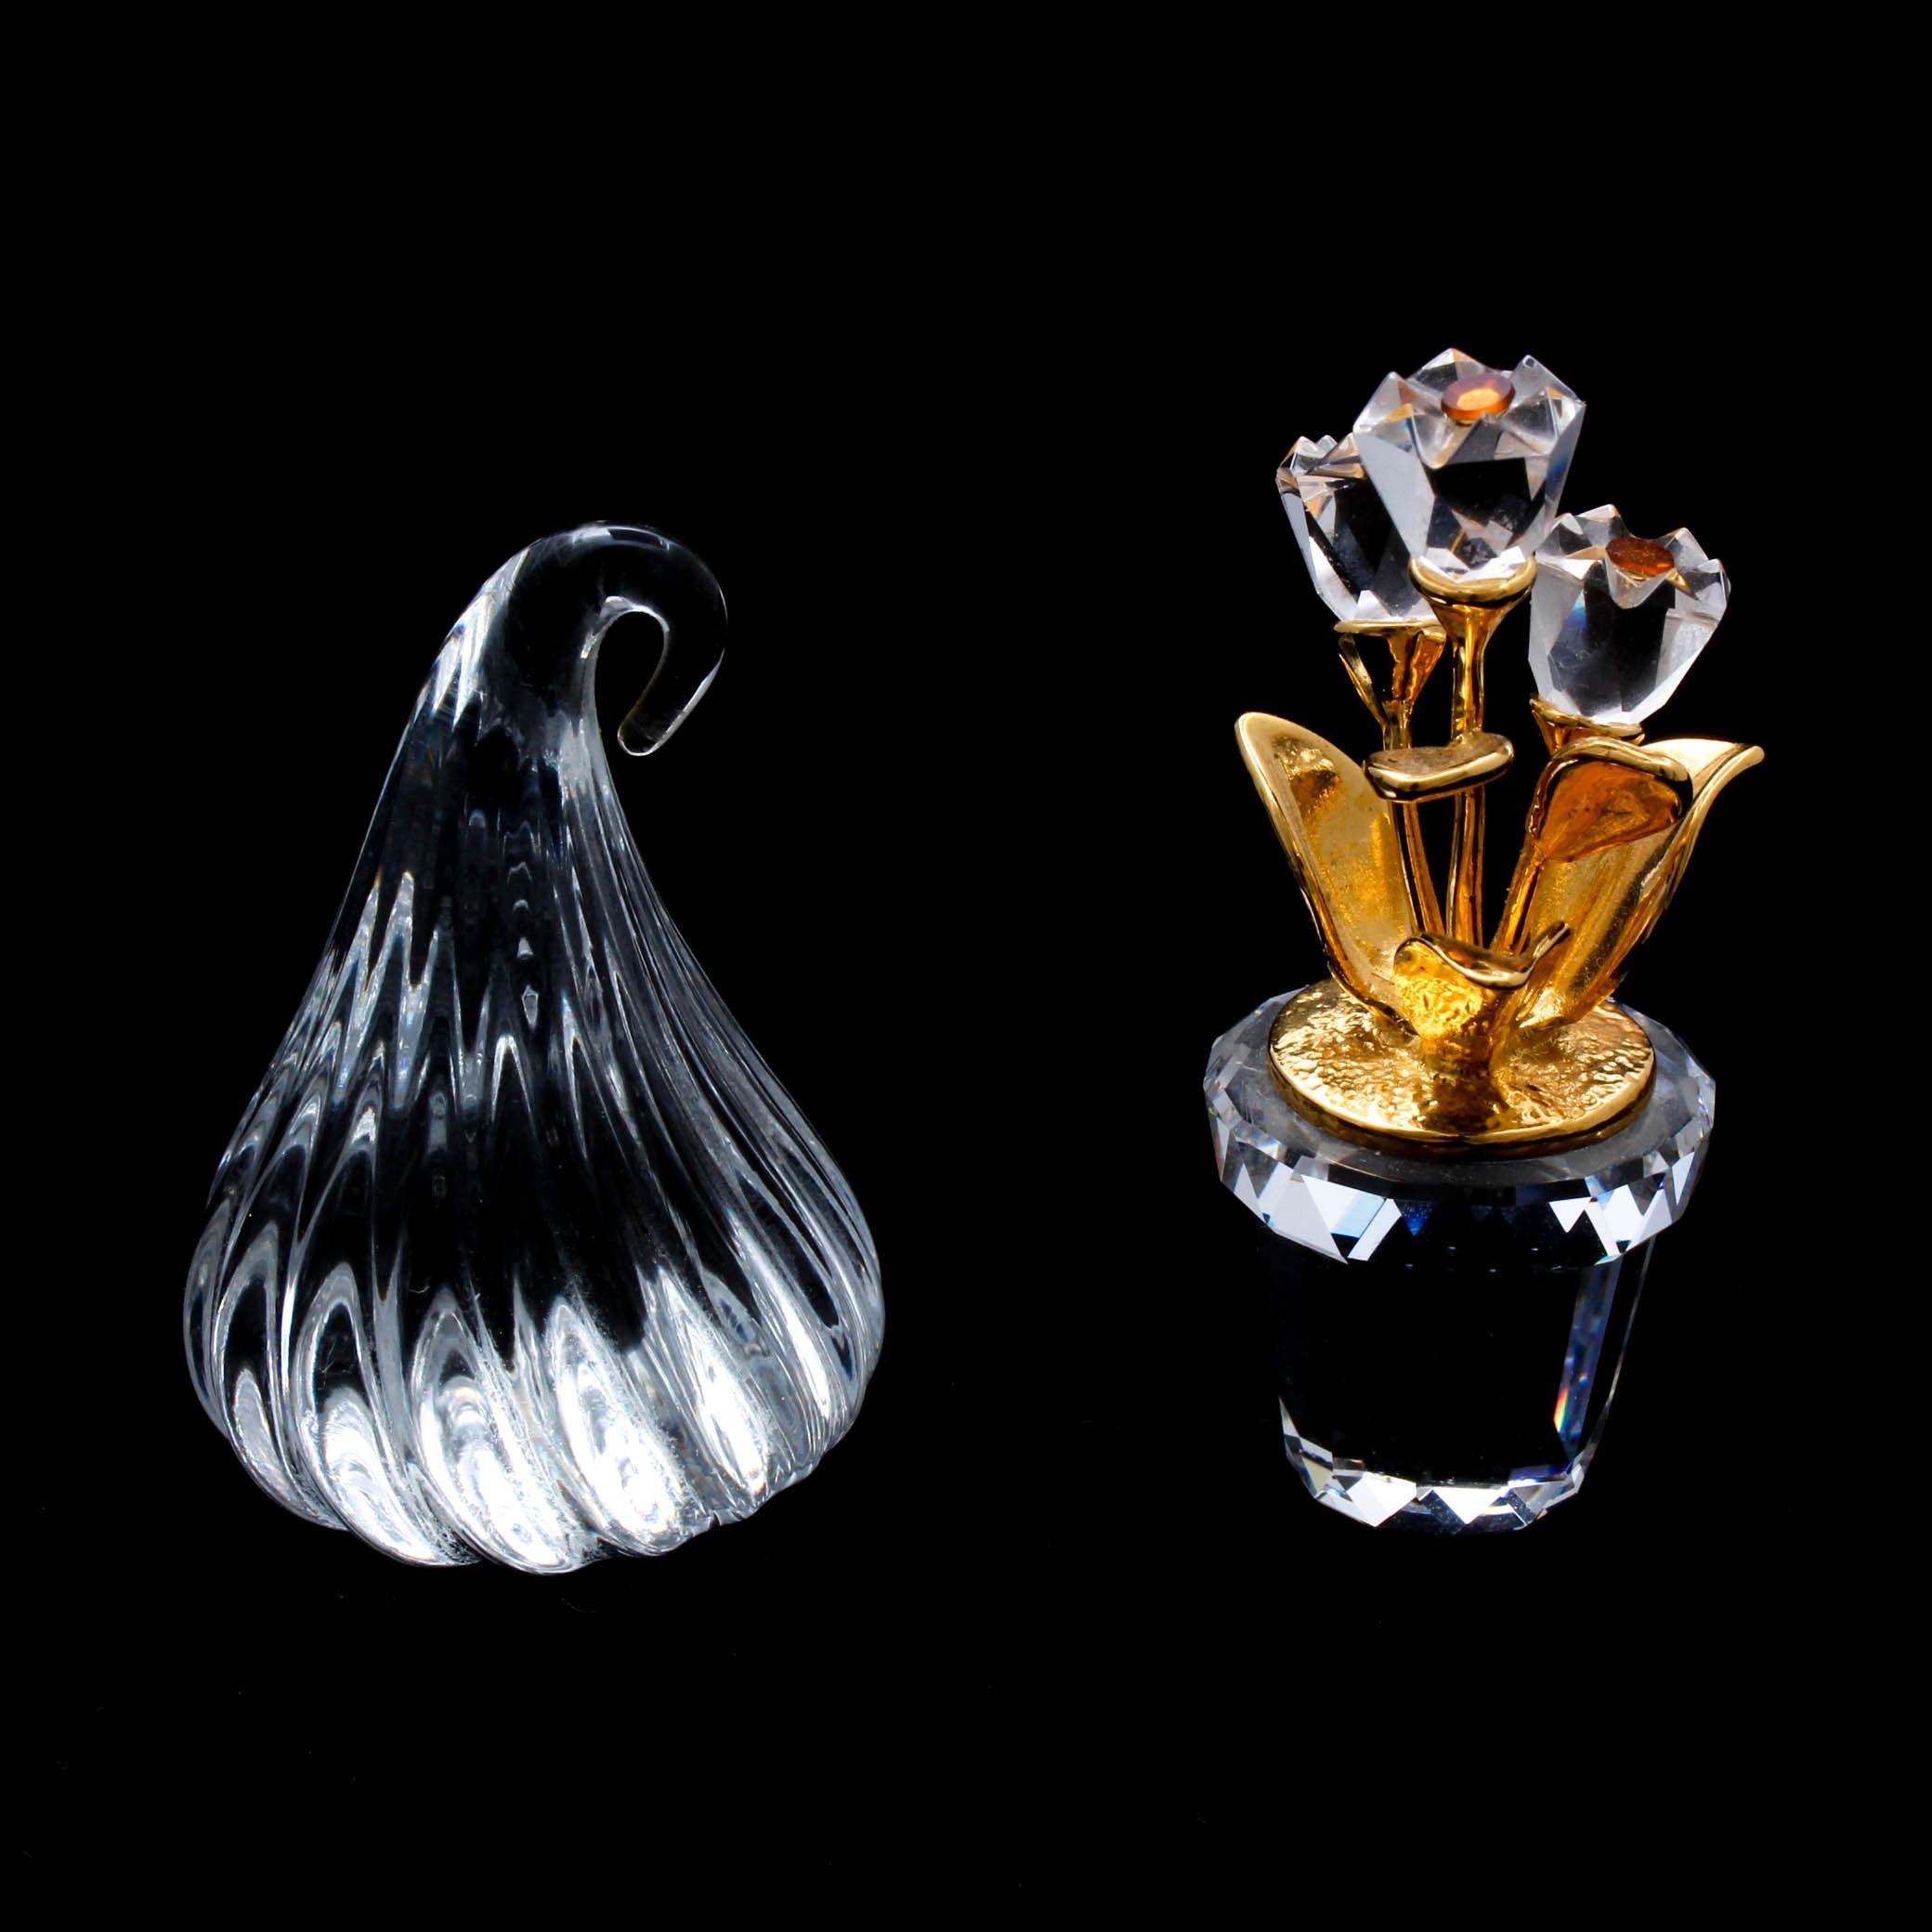 Swarovski Crystal Flower Figurine and Handblown Glass Chocolate Kiss